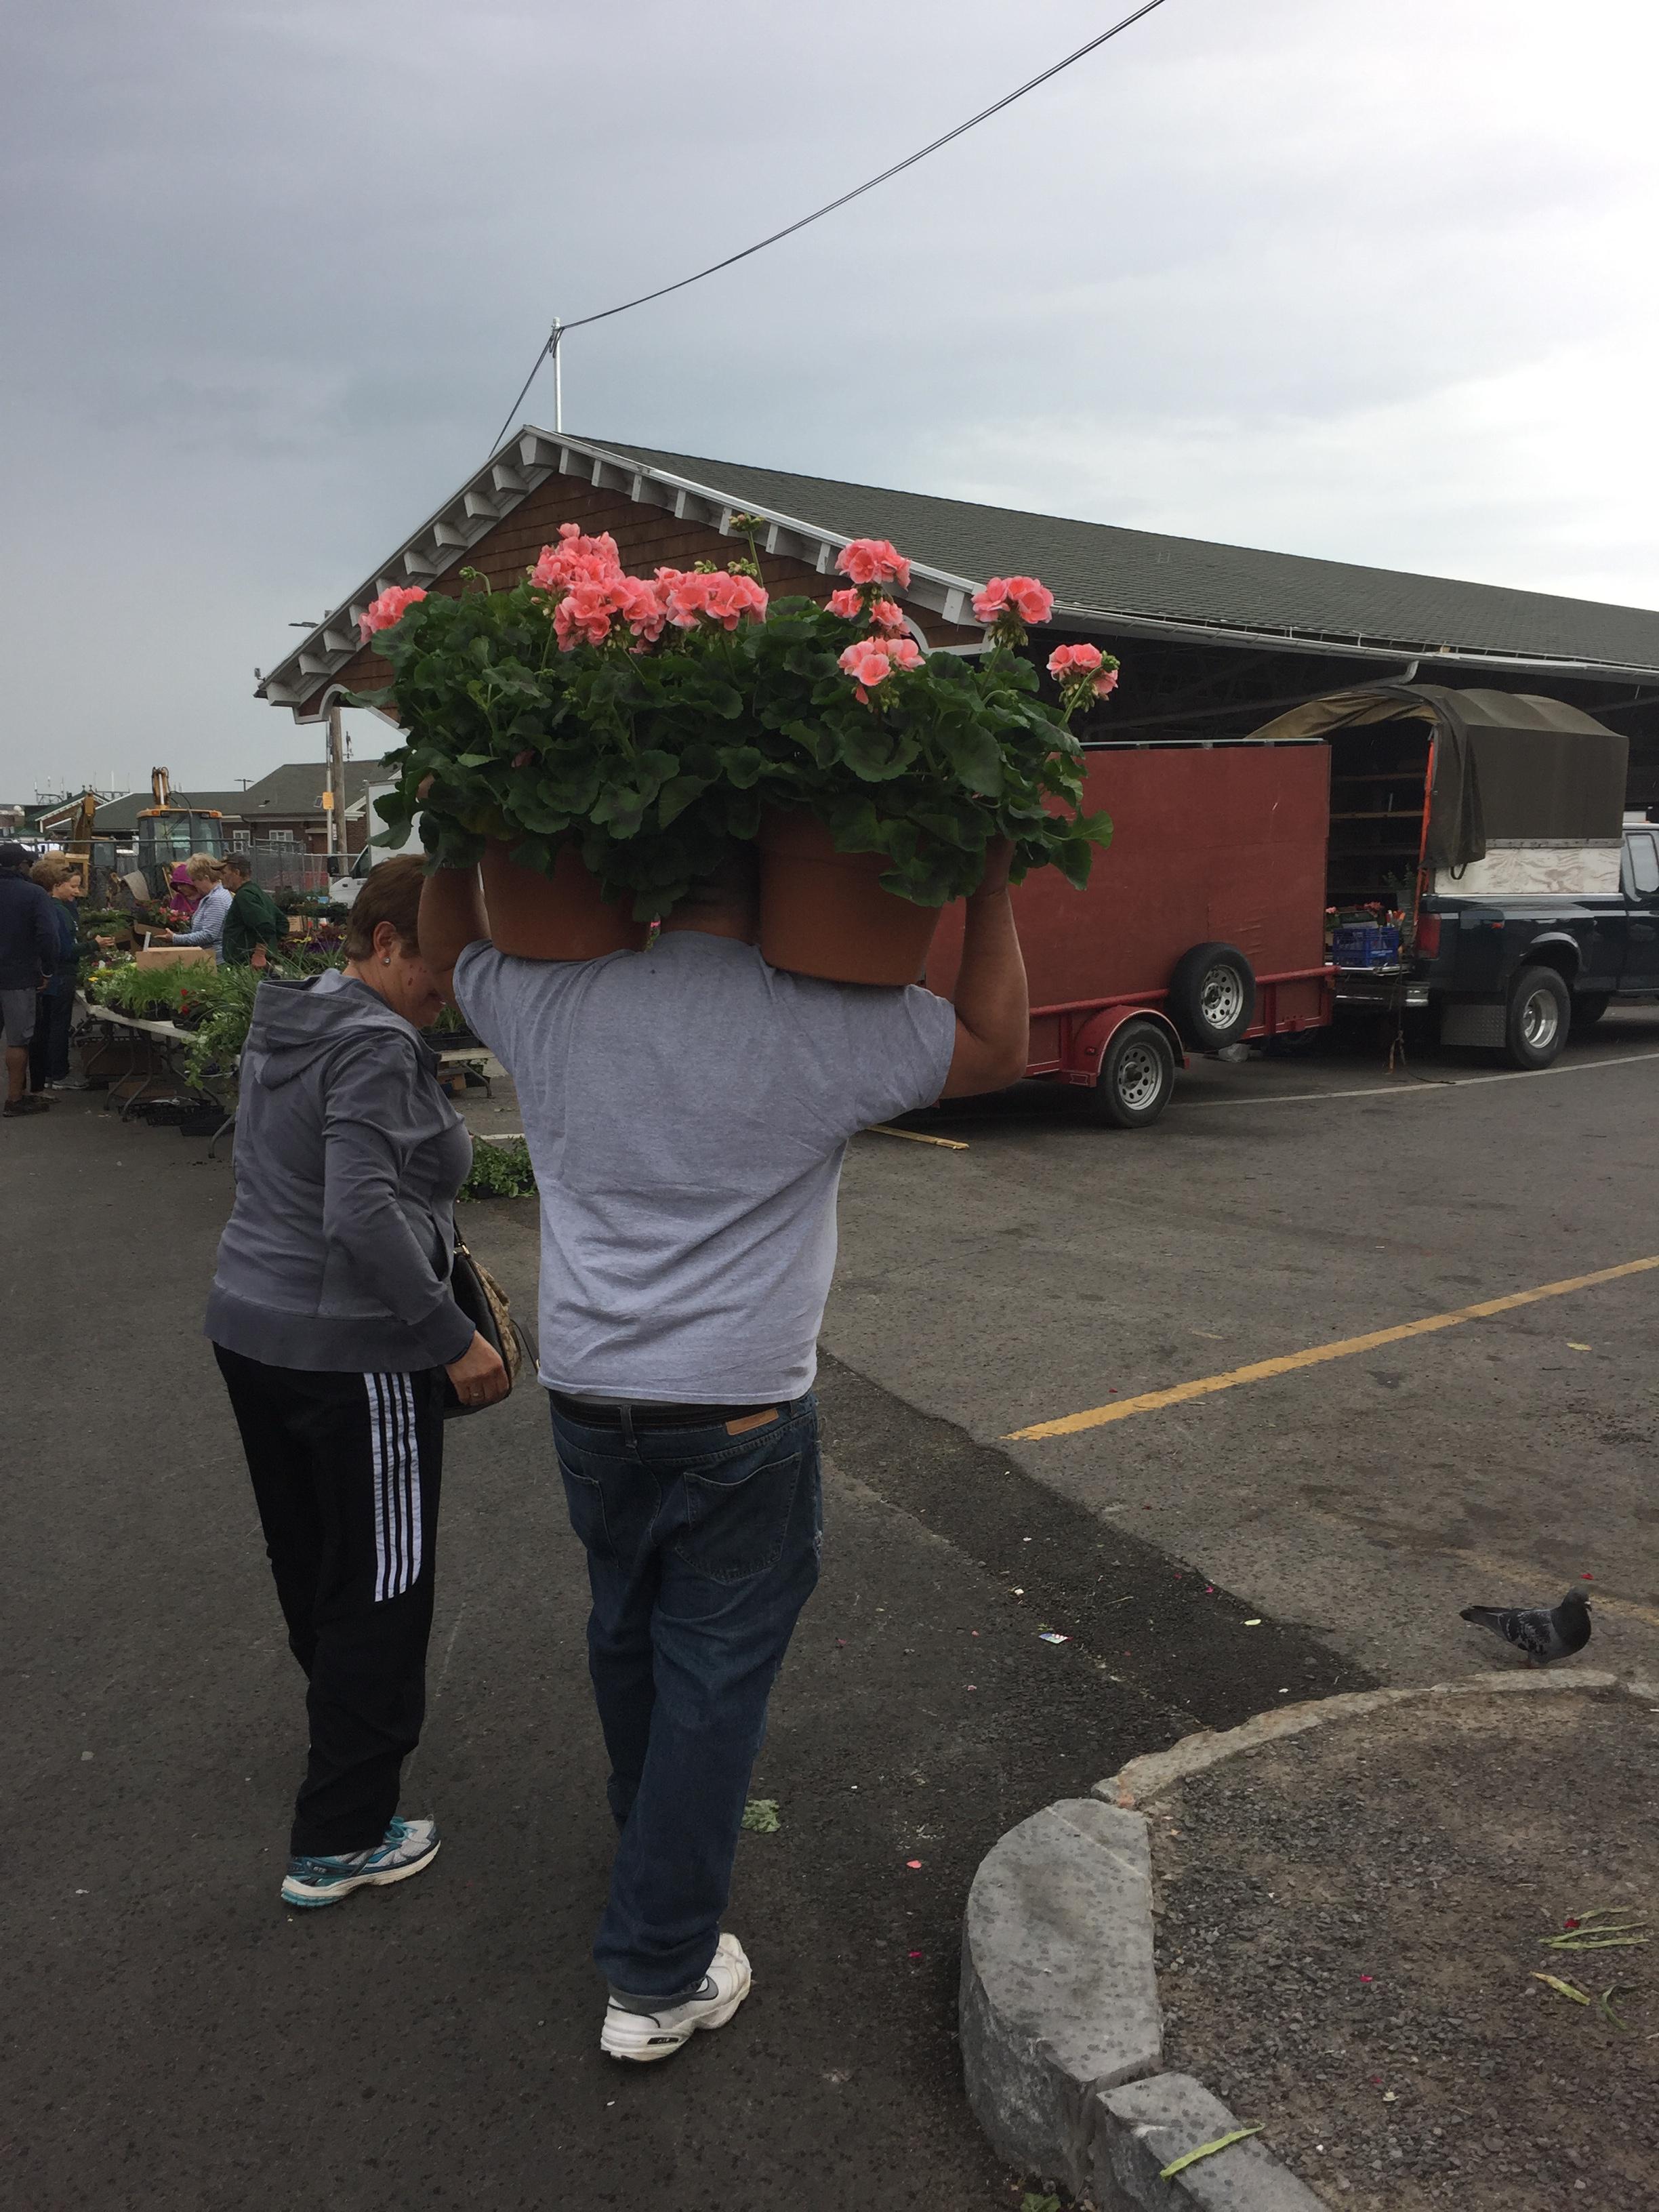 ae6ddf57146b Flower City Days at the Market